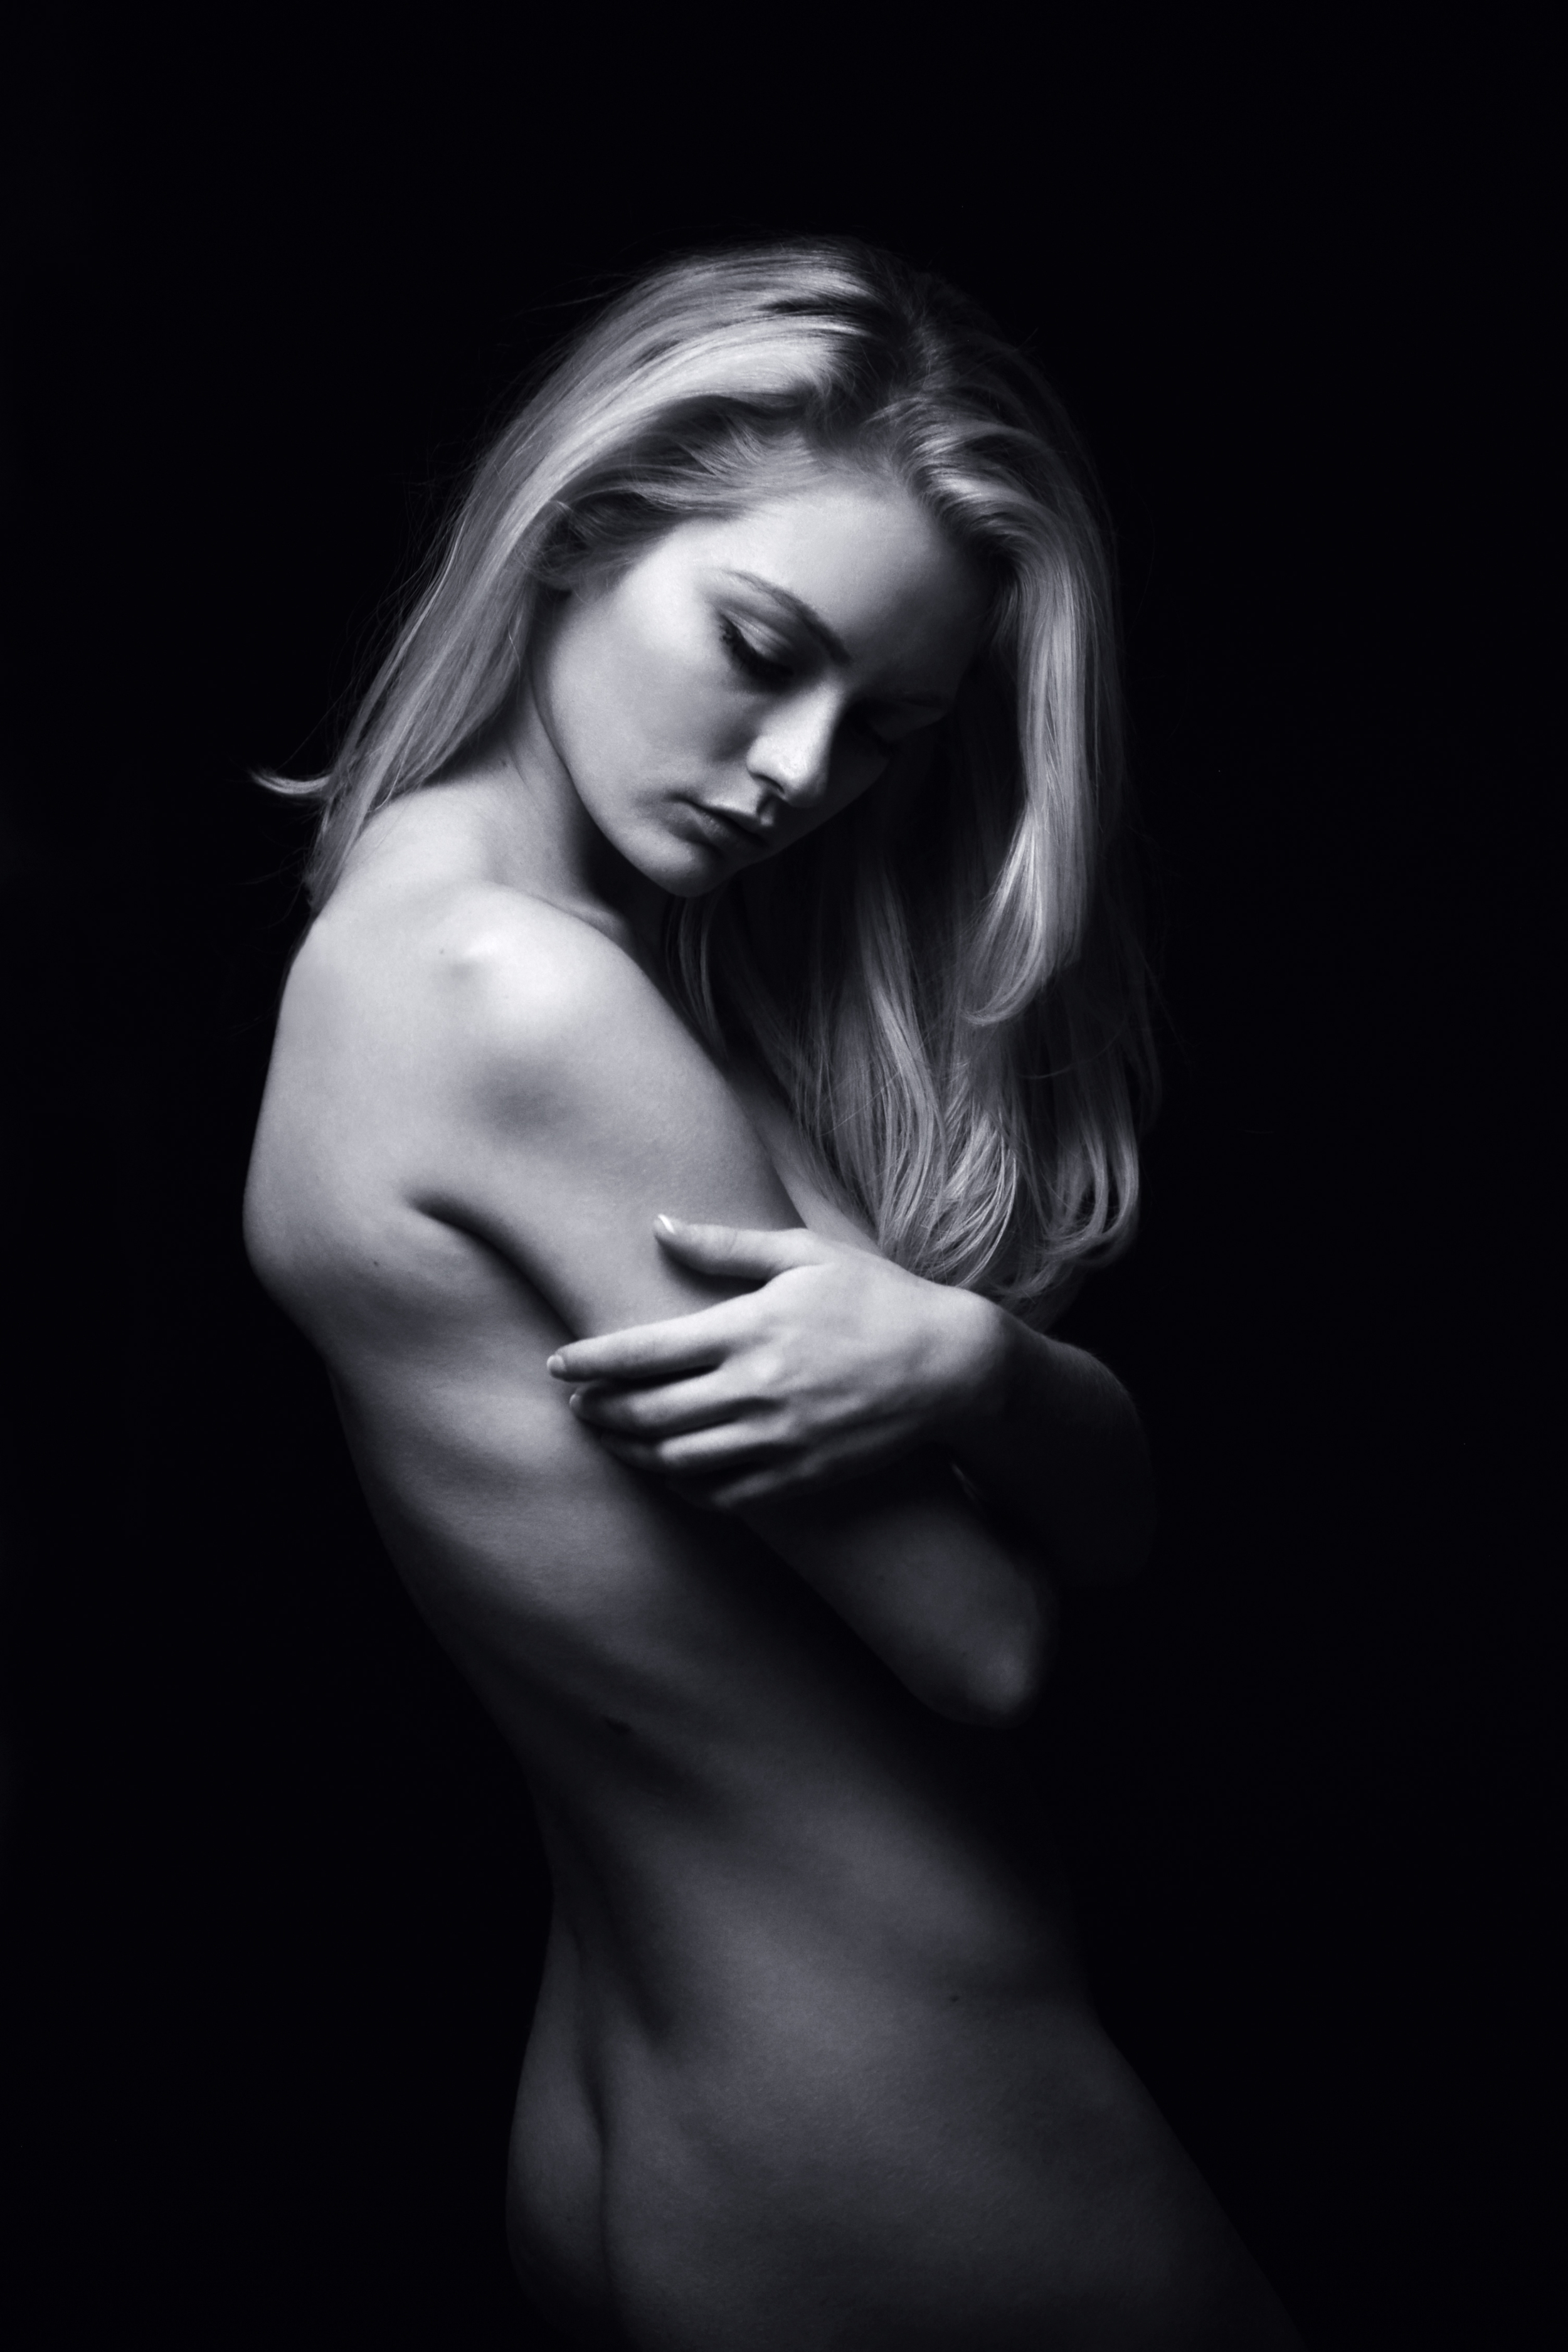 Nude Glamour 3.jpg